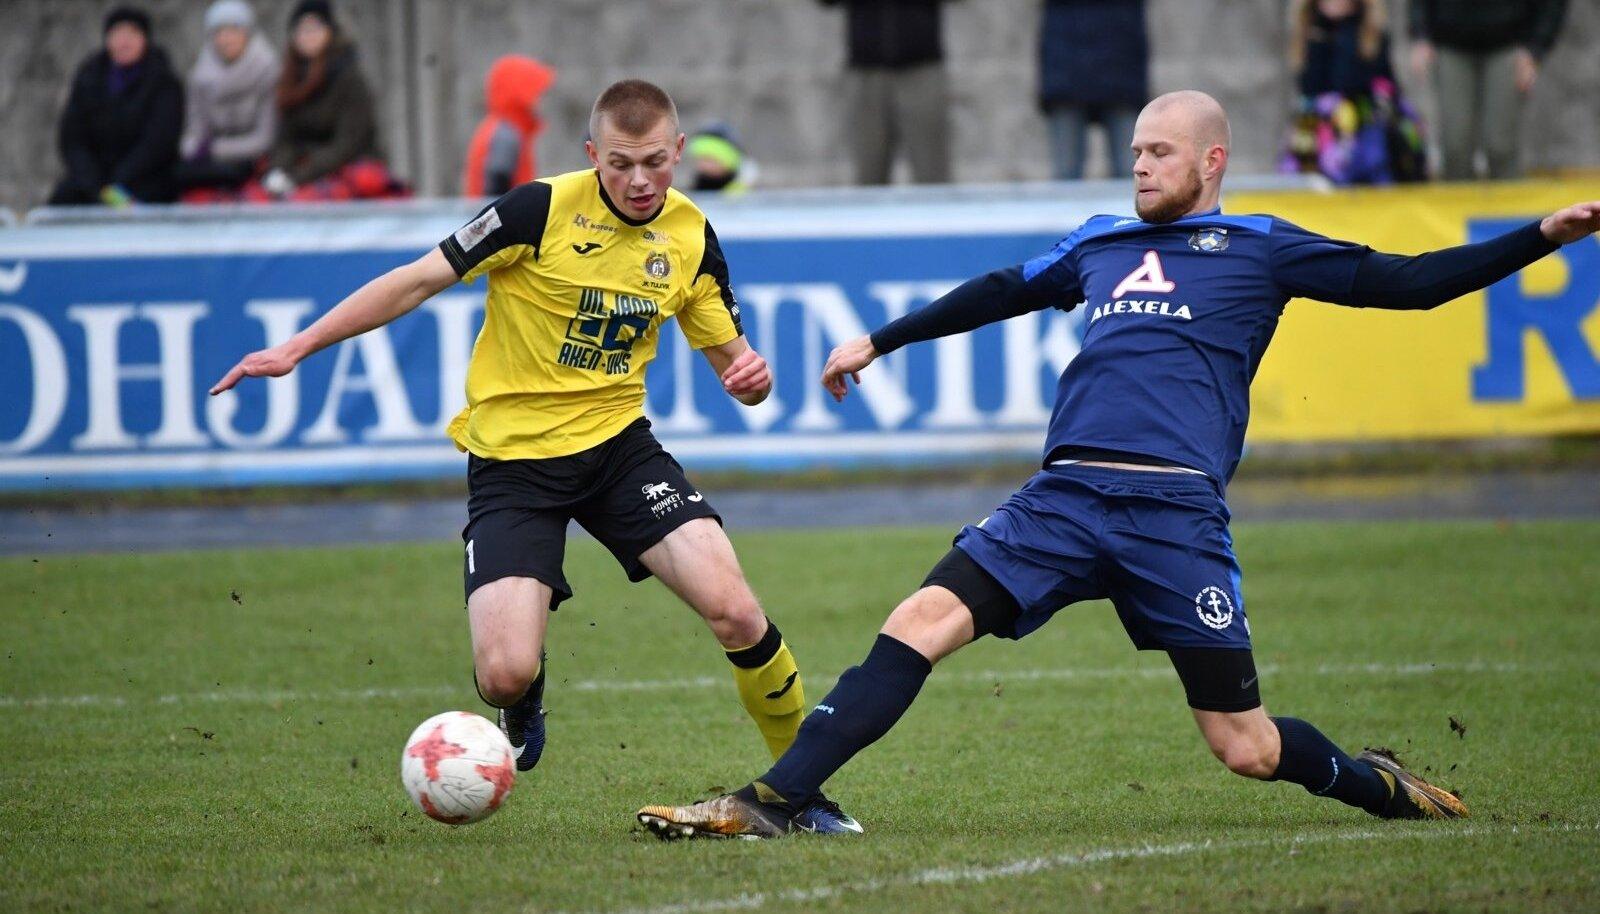 Jalgpall Sillamae Kalev vs Viljandi Tulevik